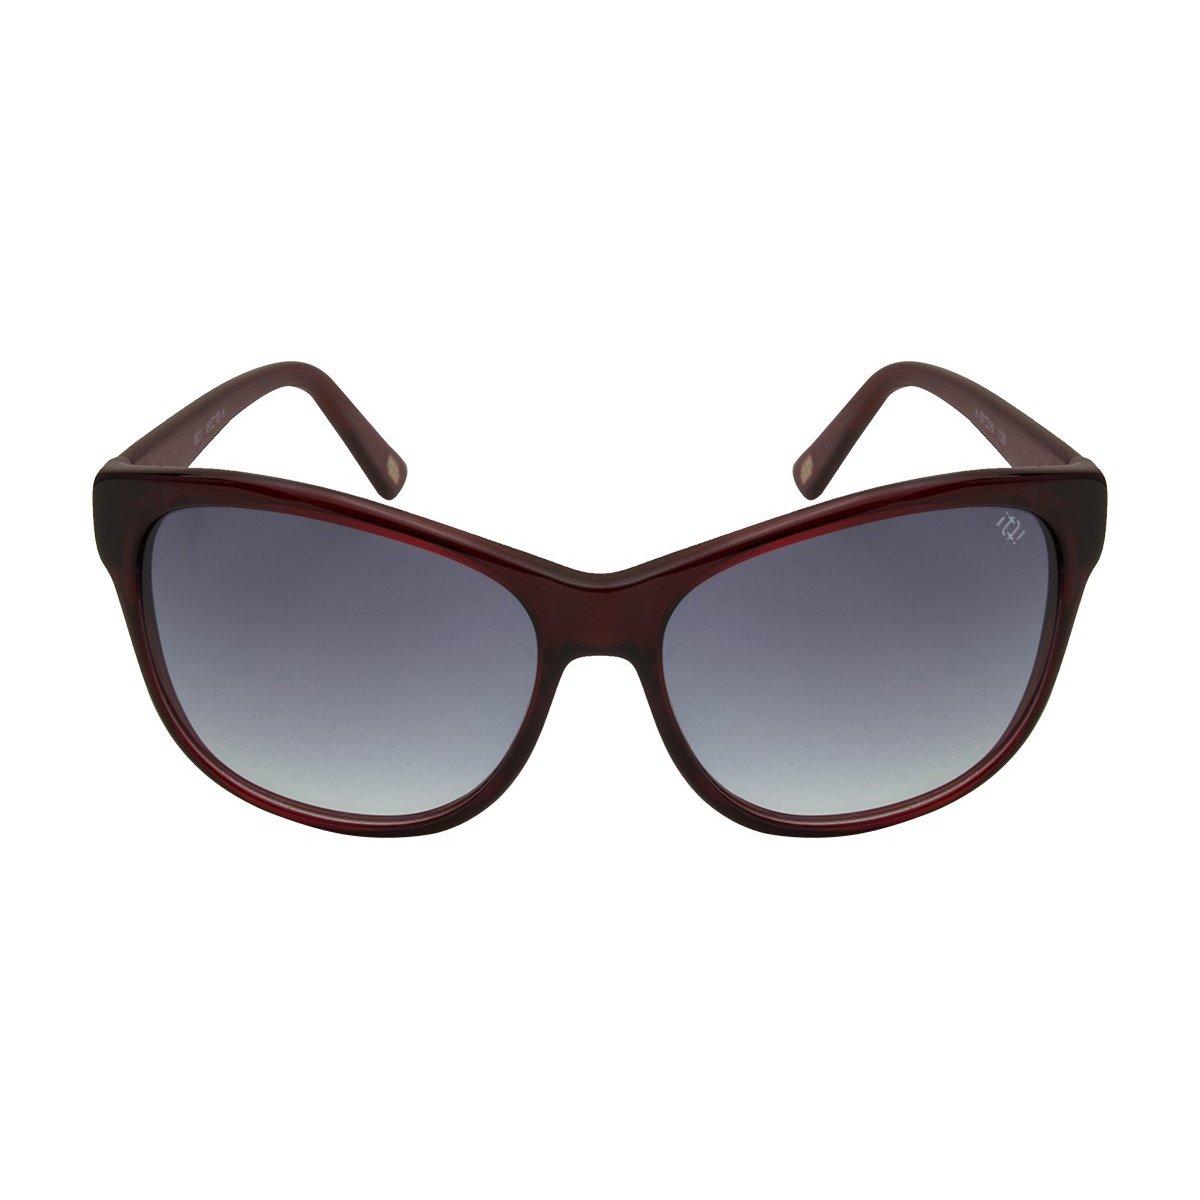 Óculos De Sol It Eyewear Possession A121 - C6 - Feminino - Compre Agora    Zattini 3101a061a5